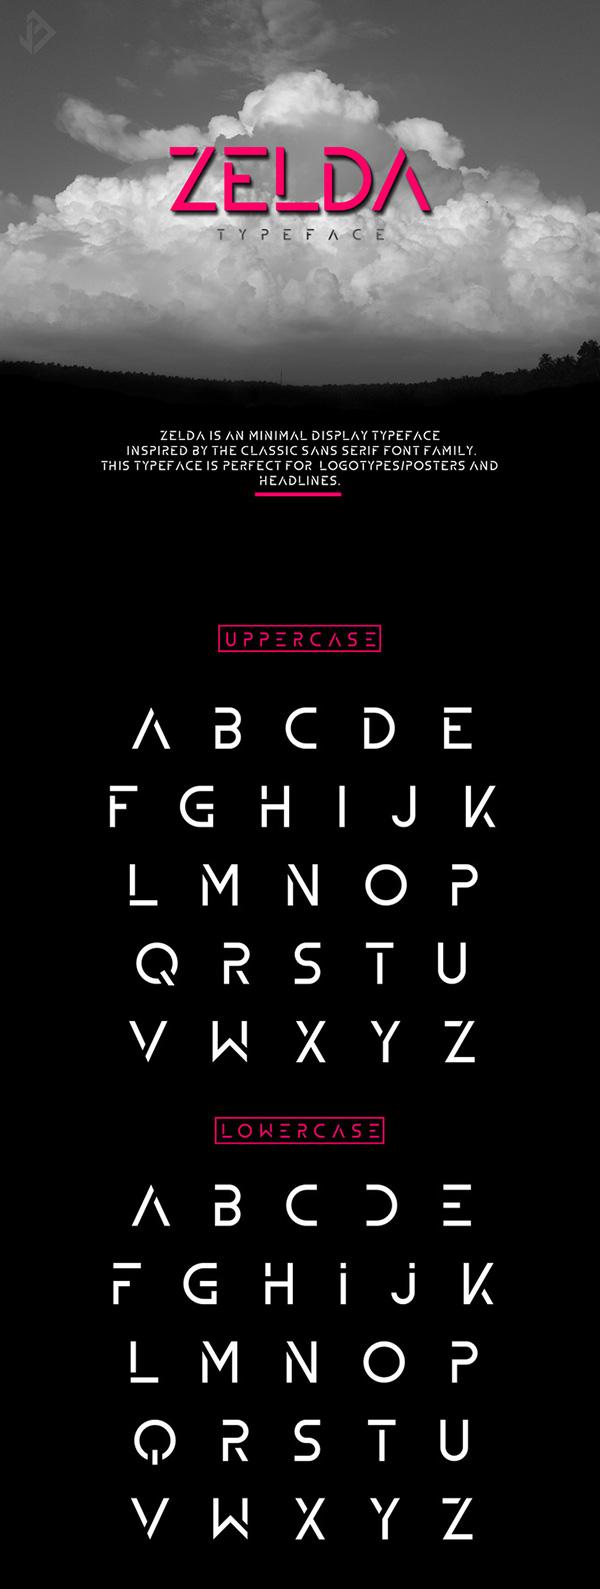 Download Gratis Font Terbaru September 2015 - Zelda - Free Font